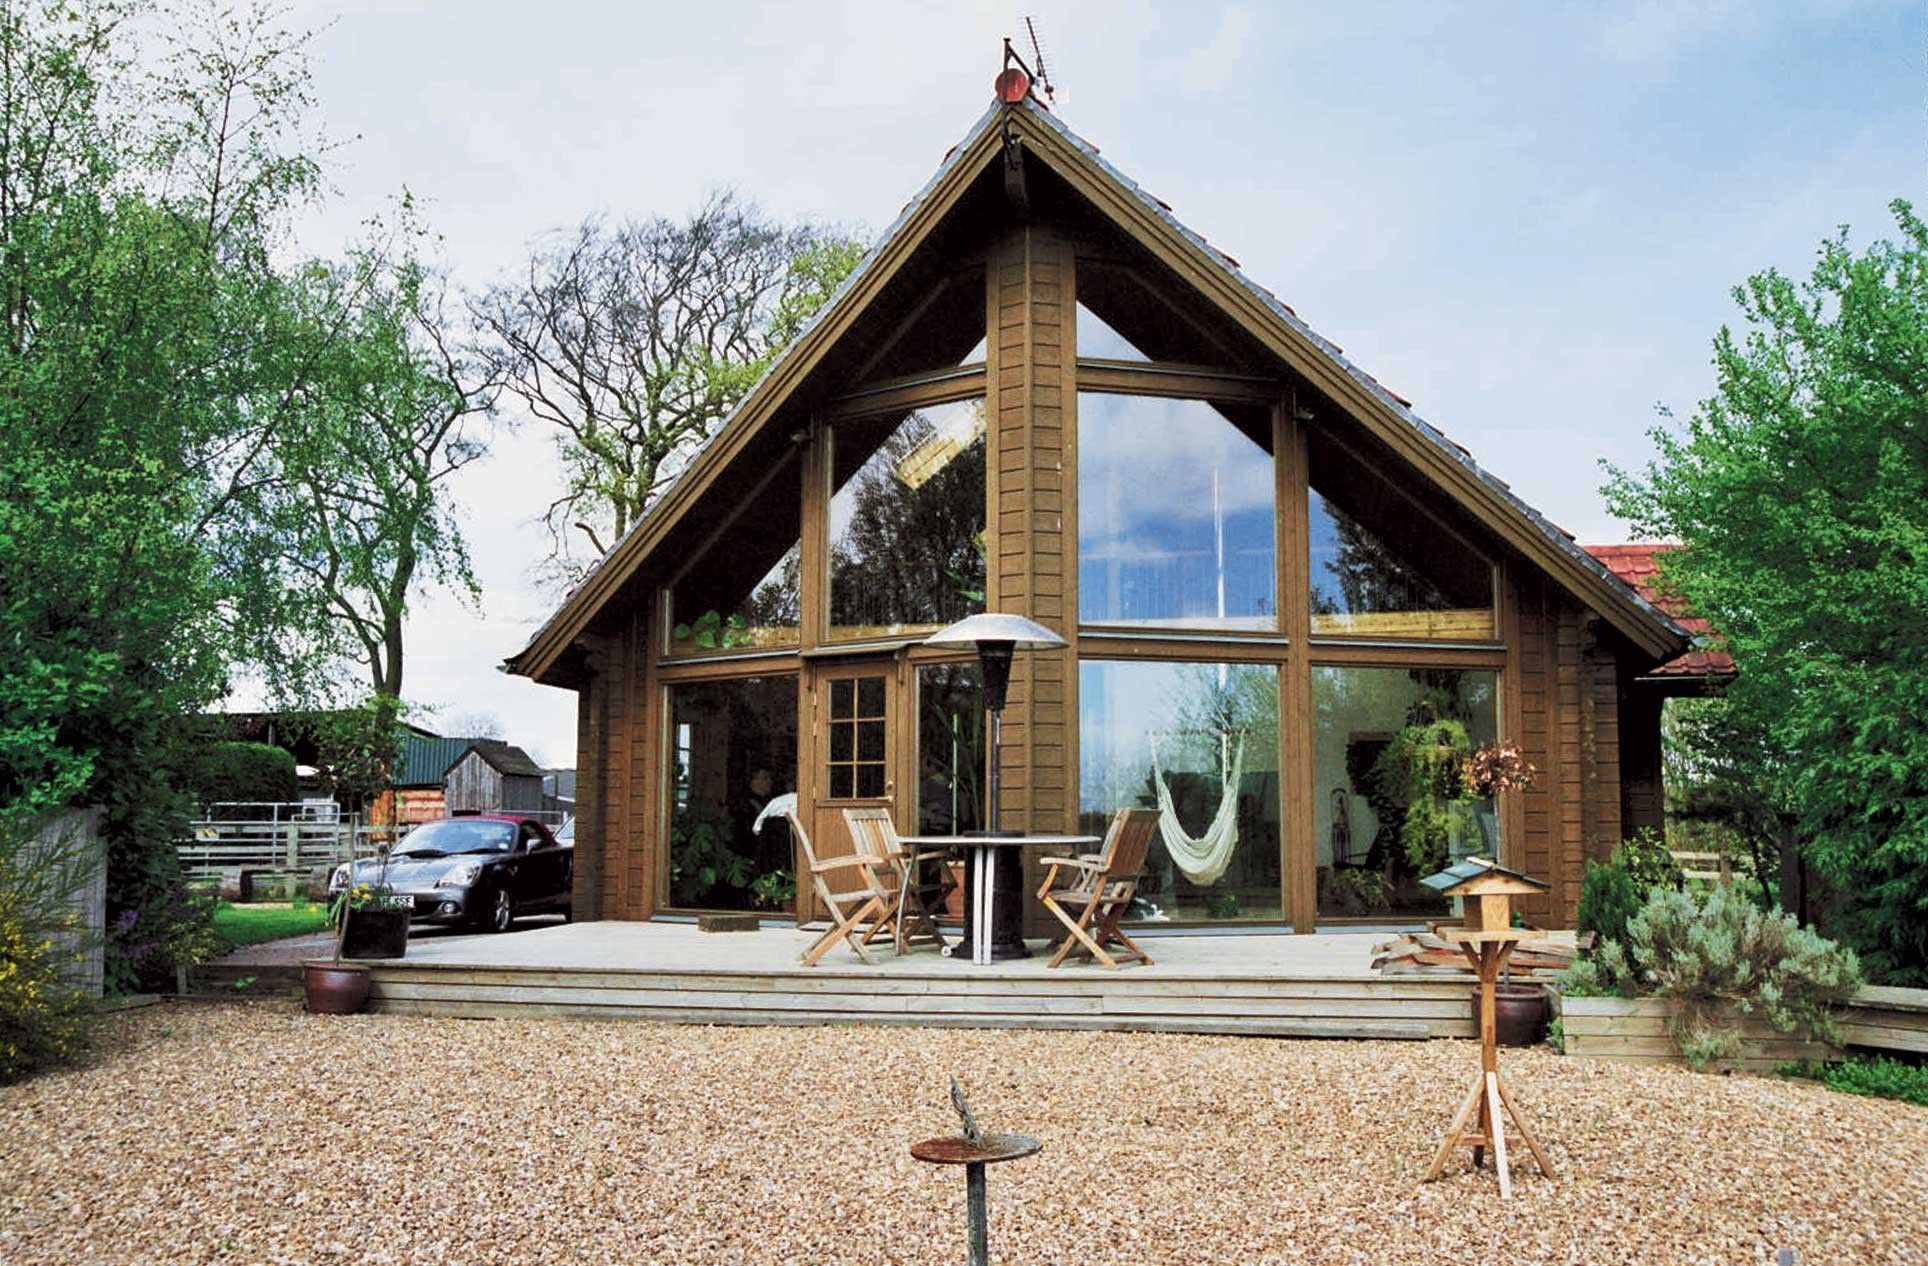 Scandinavian Houses eurohouse 159 m sq - mountain lodge homes - log home kits for sale